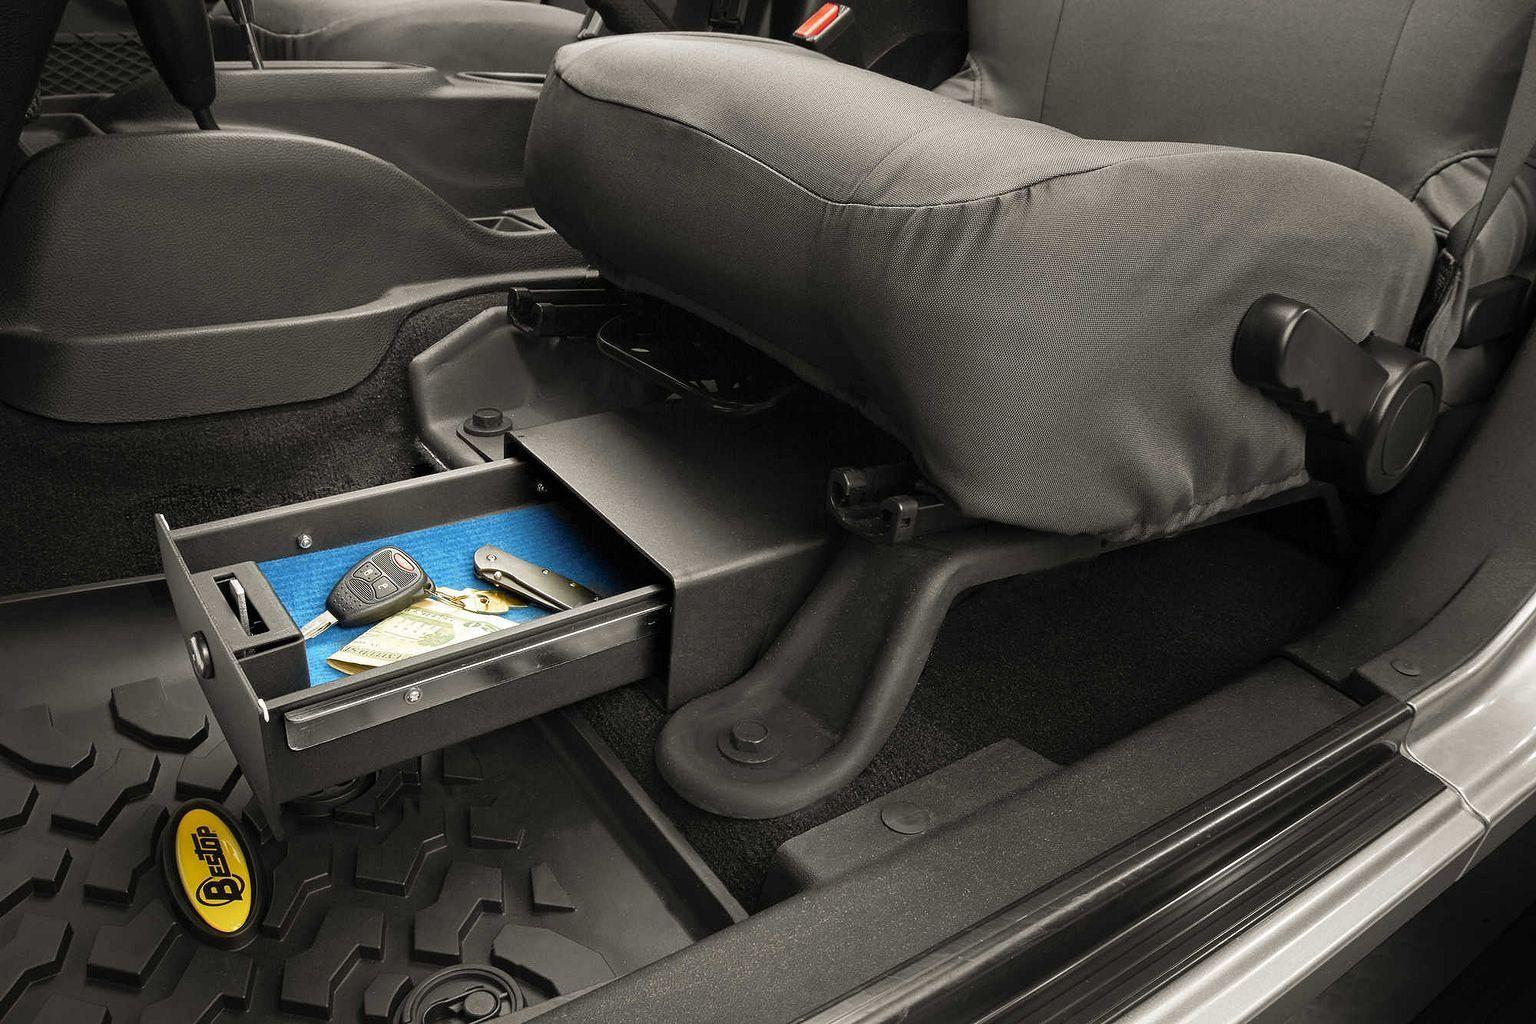 Jeep Wrangler Accessories Ideas 14 Jeep Wrangler Accessories